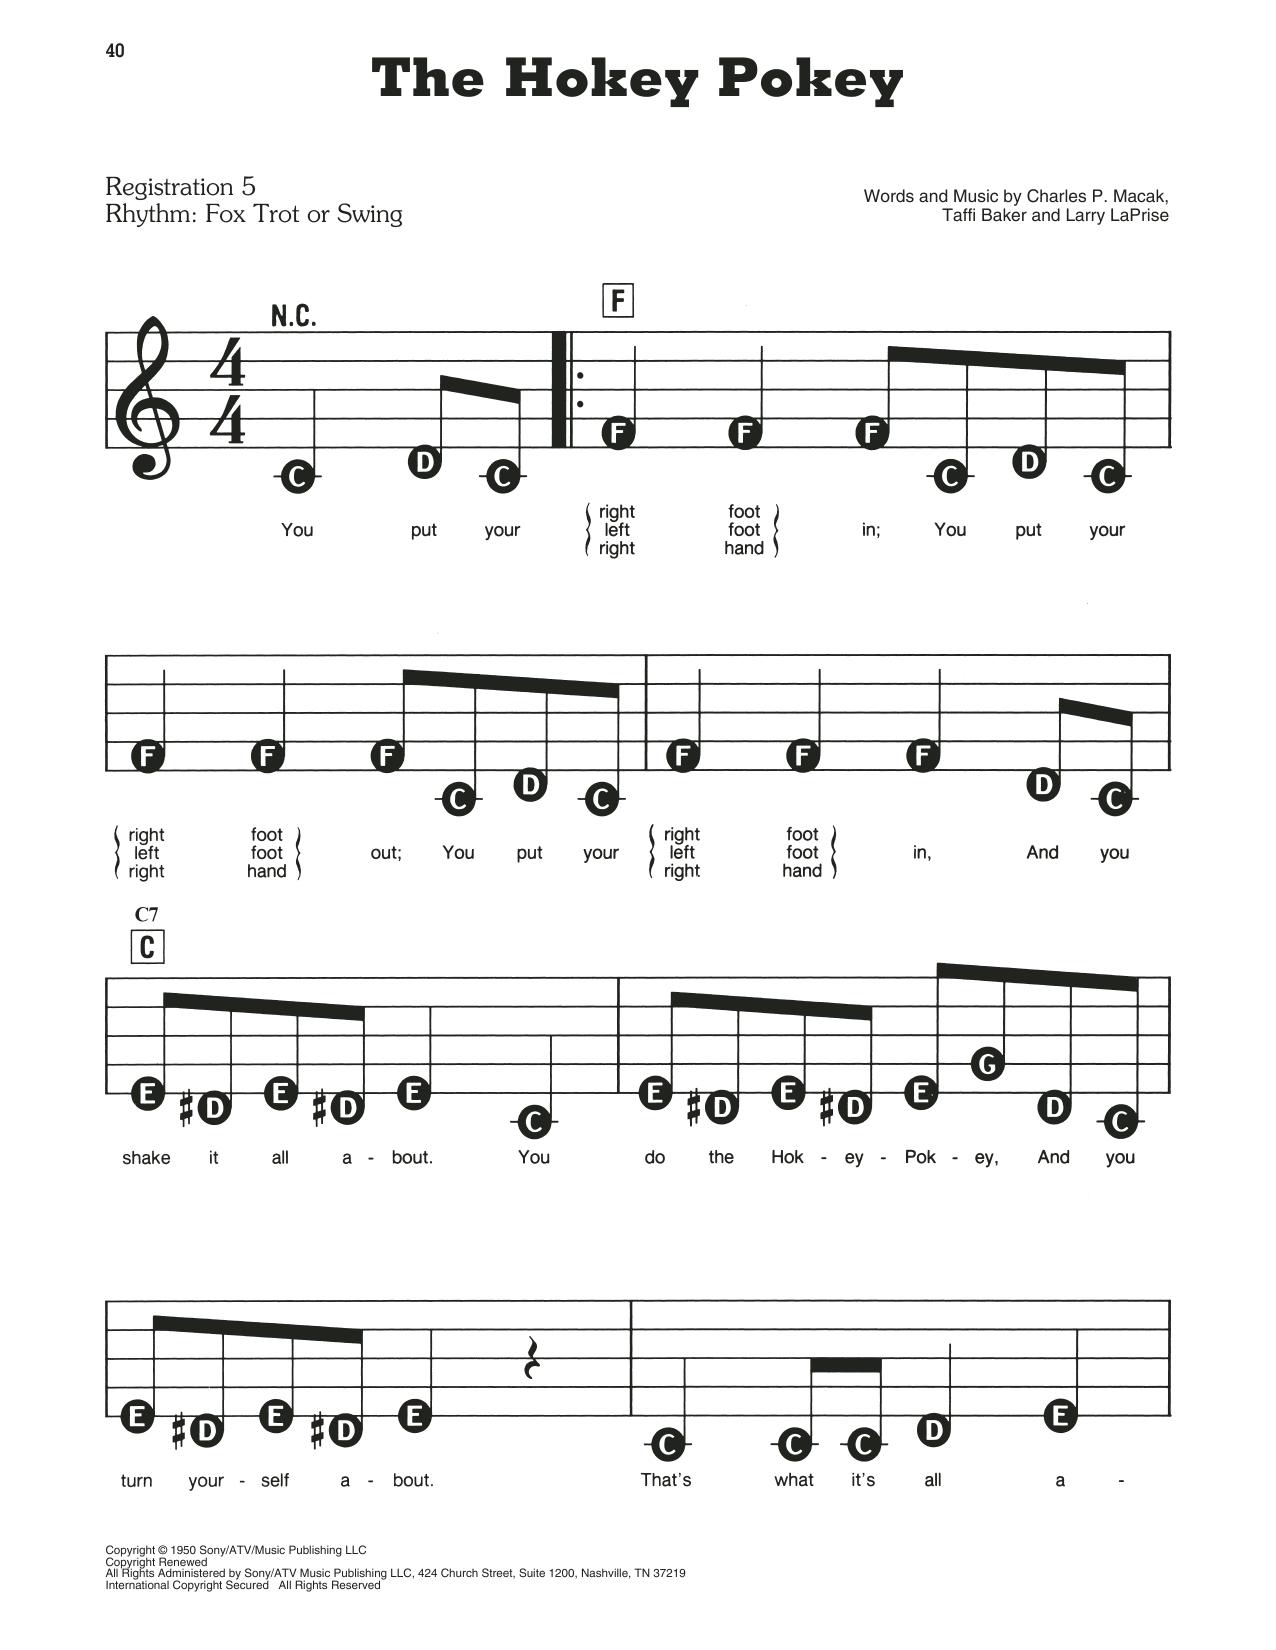 The Hokey Pokey Sheet Music